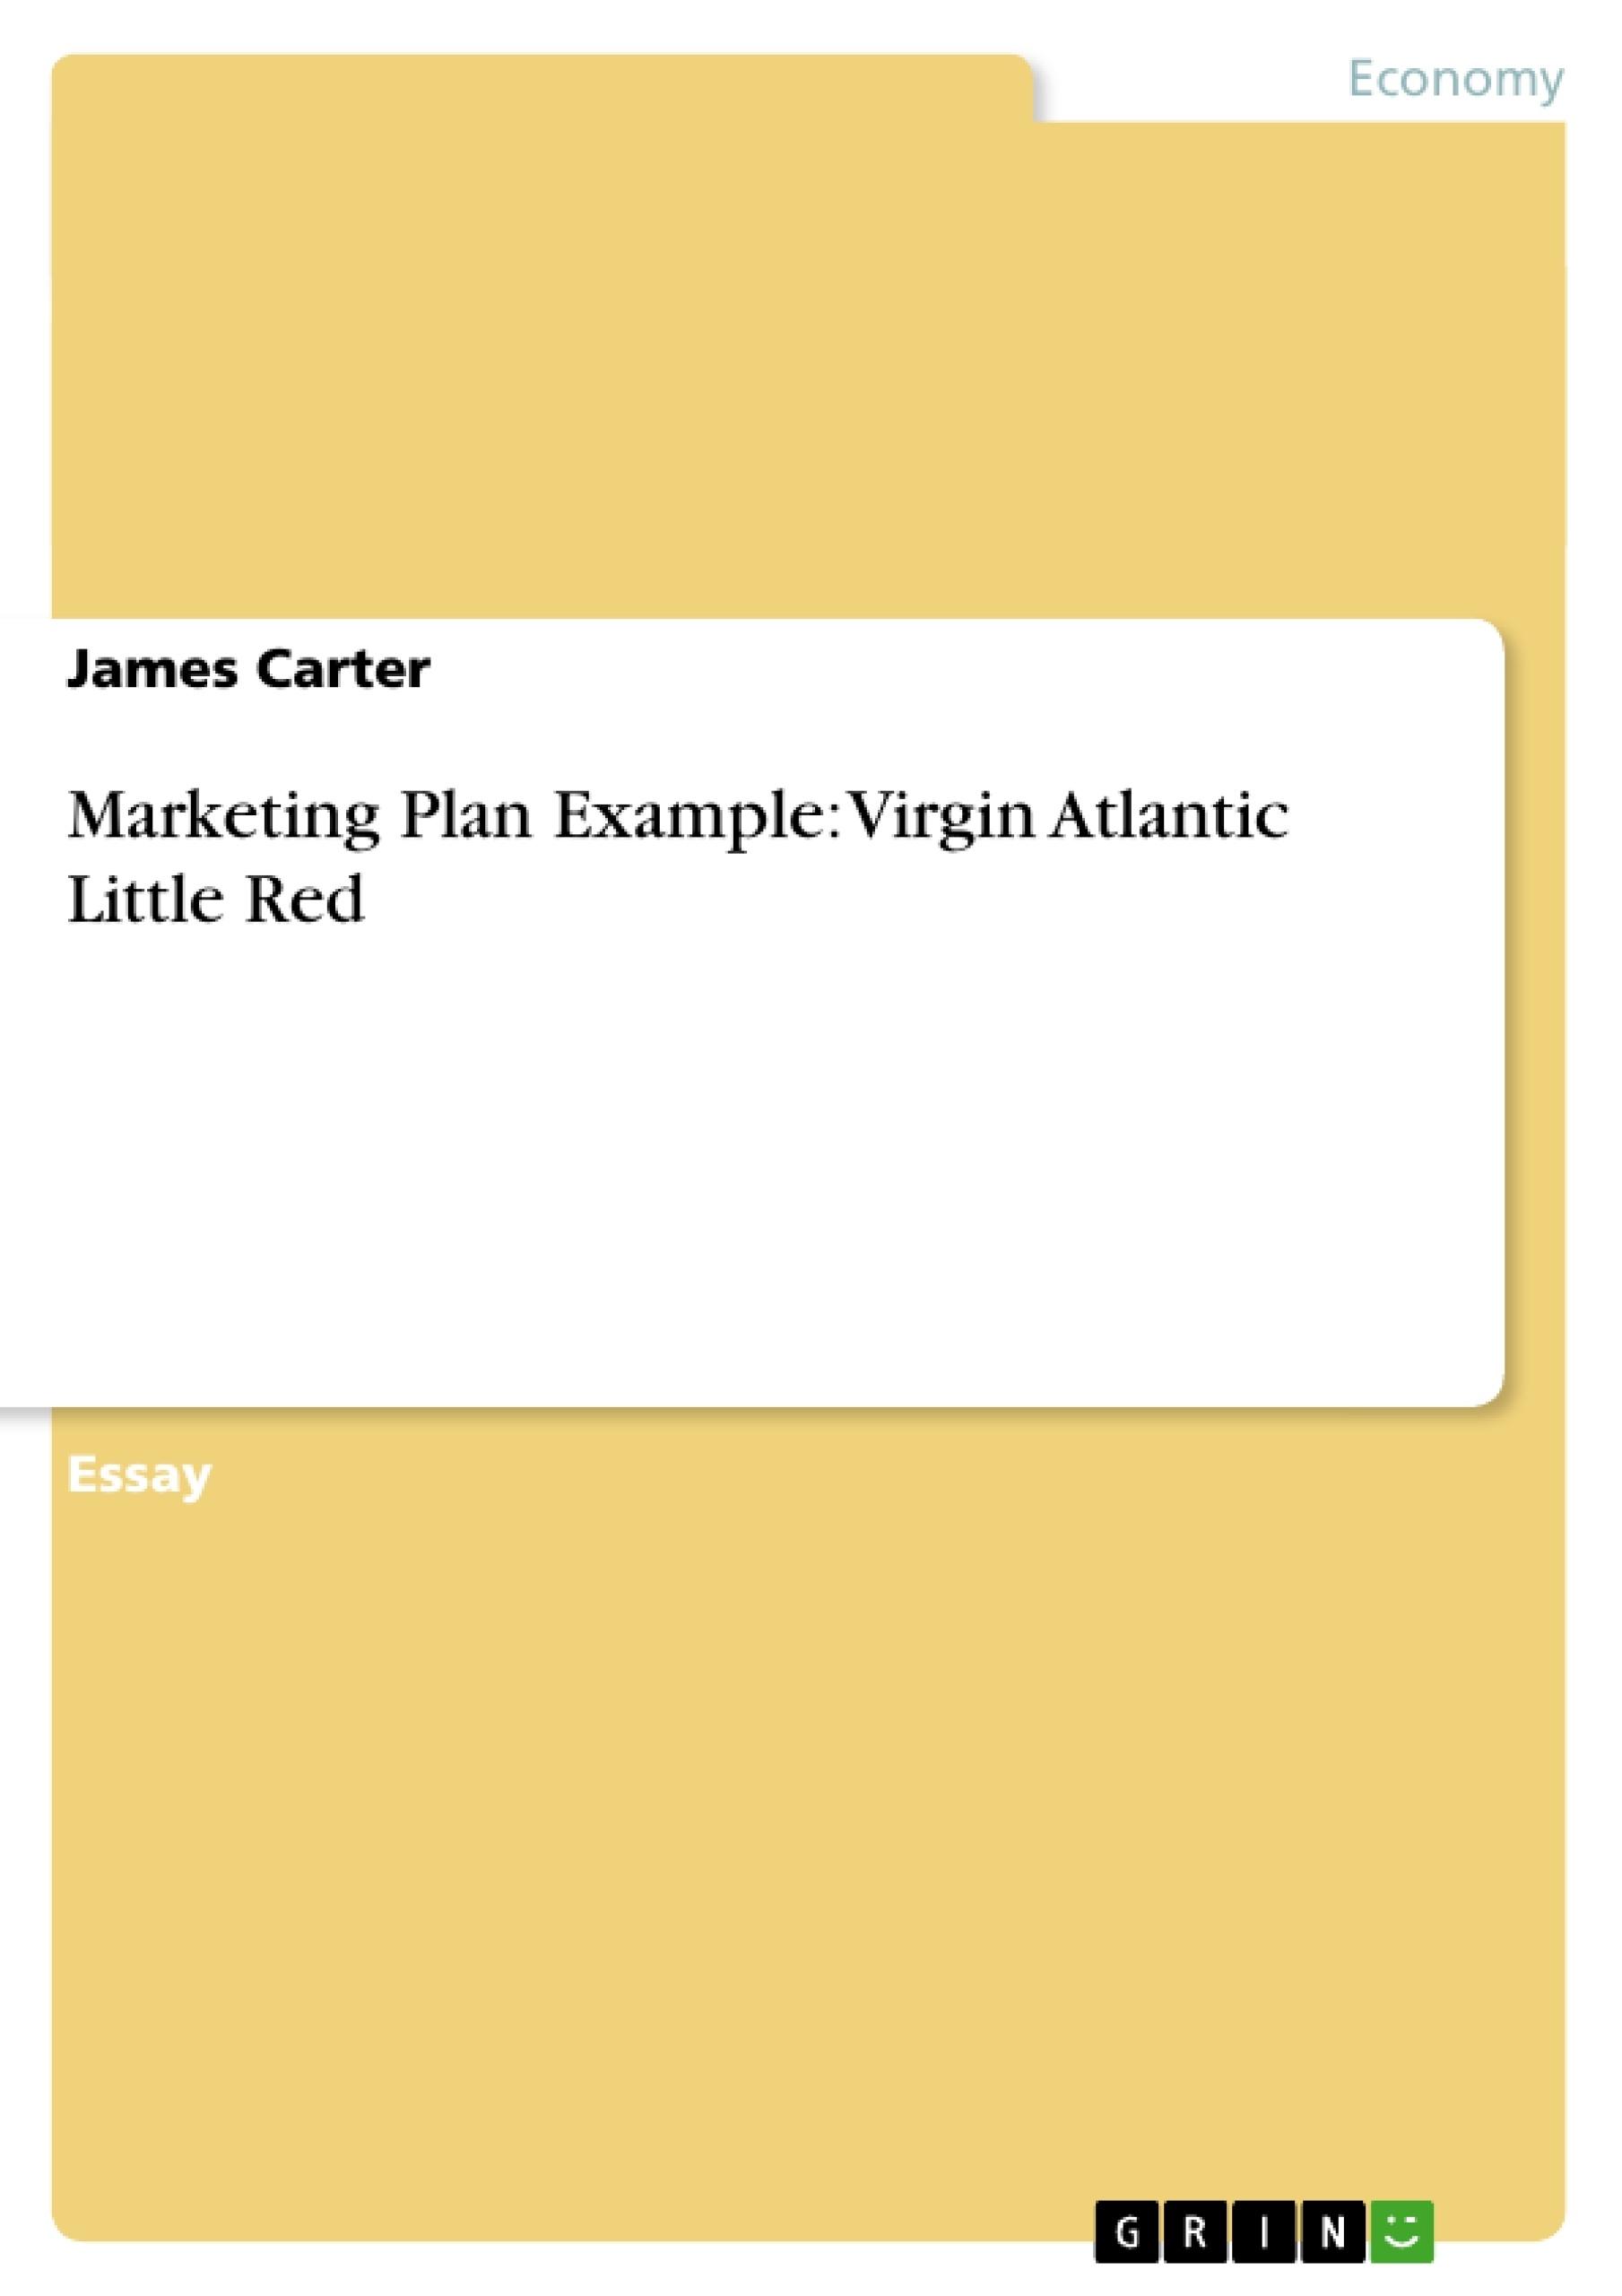 Title: Marketing Plan Example: Virgin Atlantic Little Red